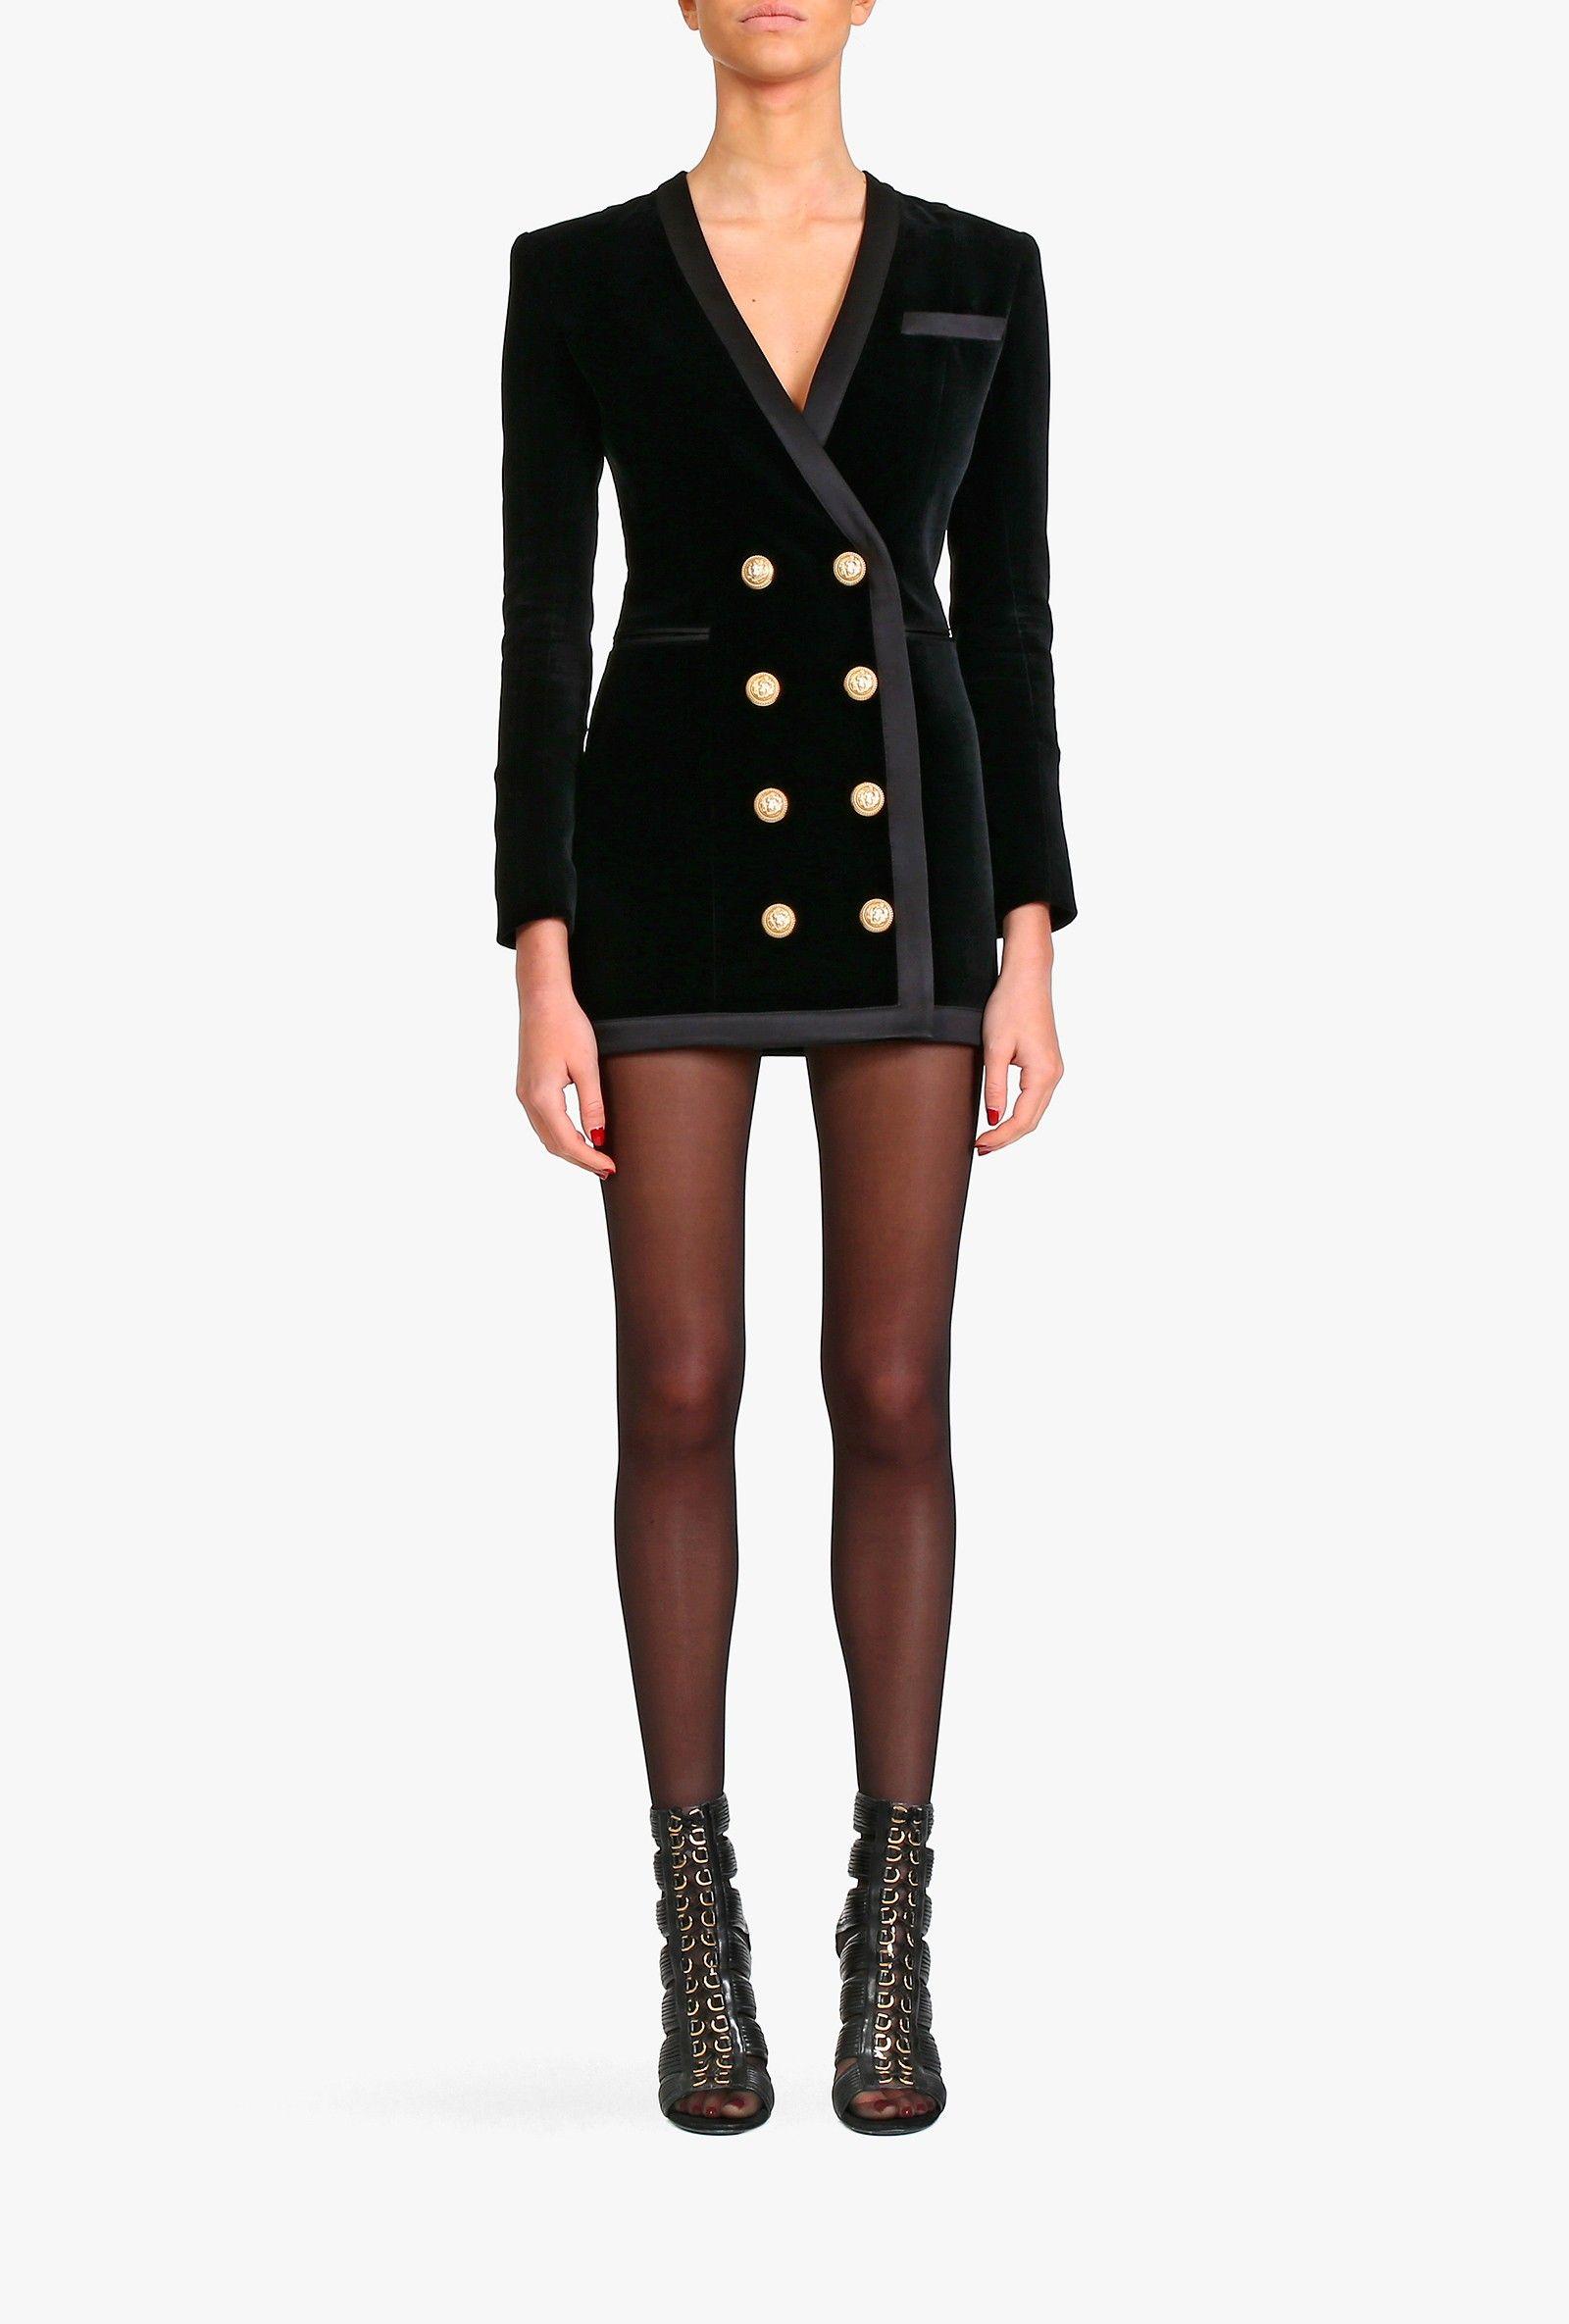 e886c37294bd67 Balmain - Double-breasted cotton-velvet mini dress - Women s dresses ...